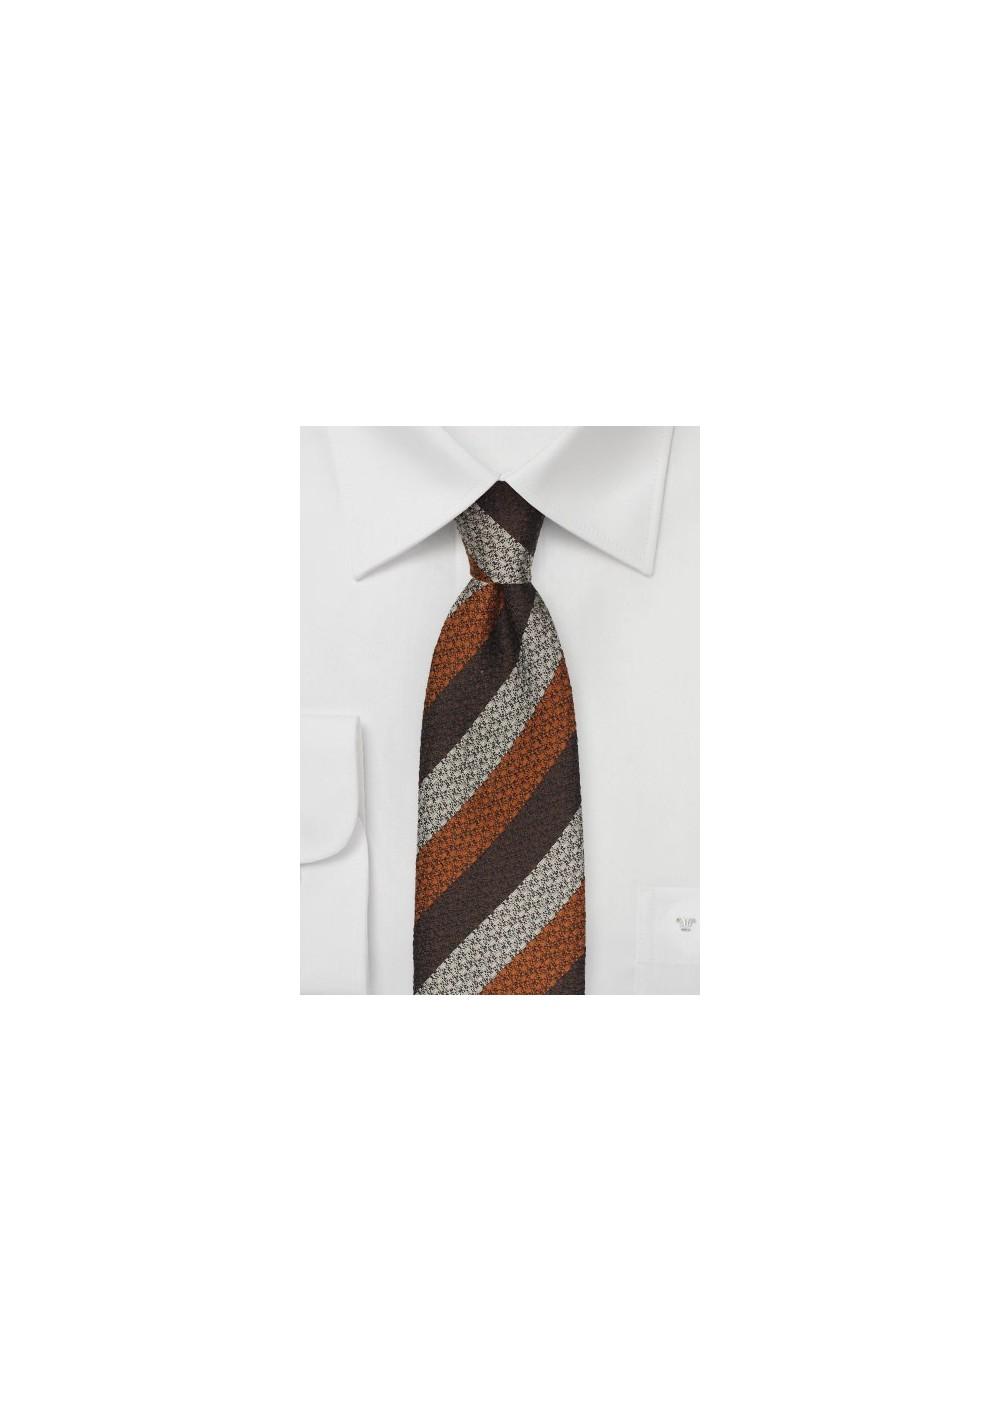 Striped Wool Tie in Brown, Copper, Silver